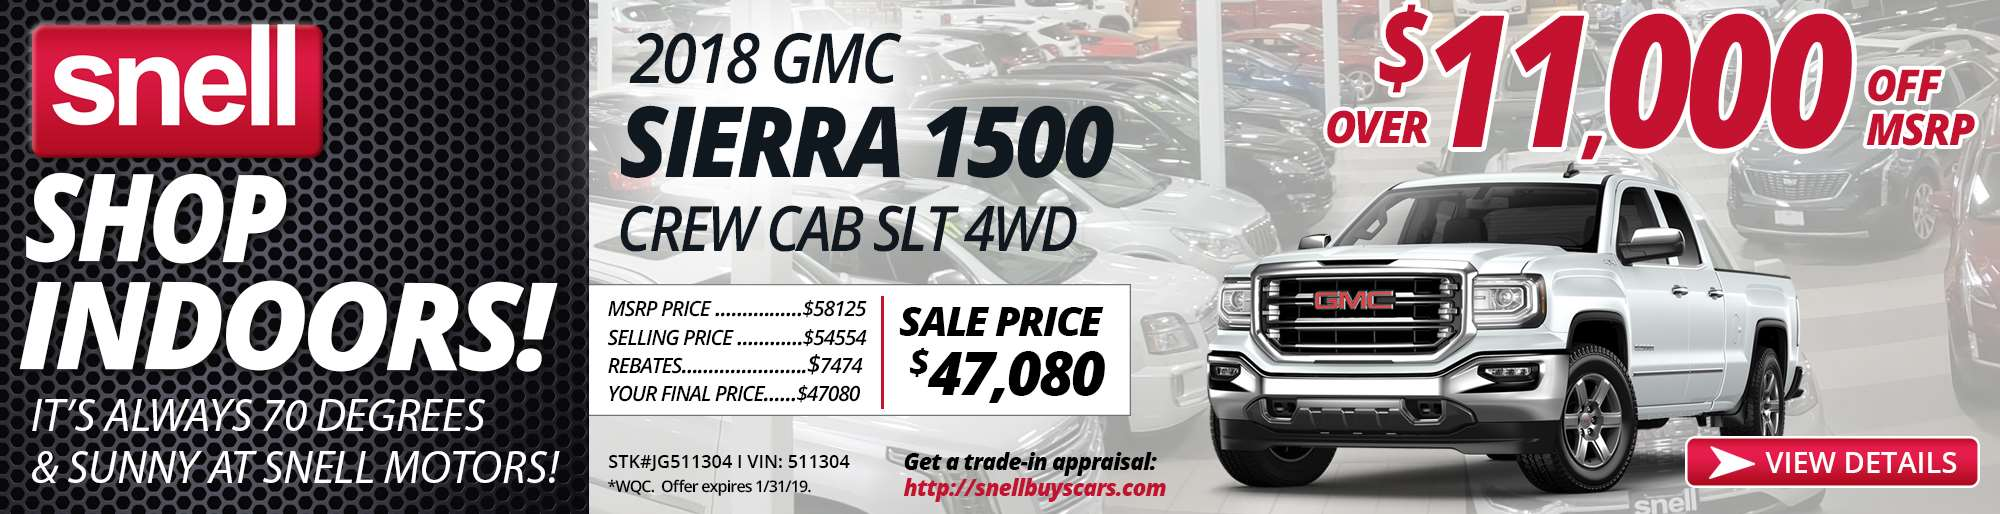 2018 GMC SIERRA CREW CAB